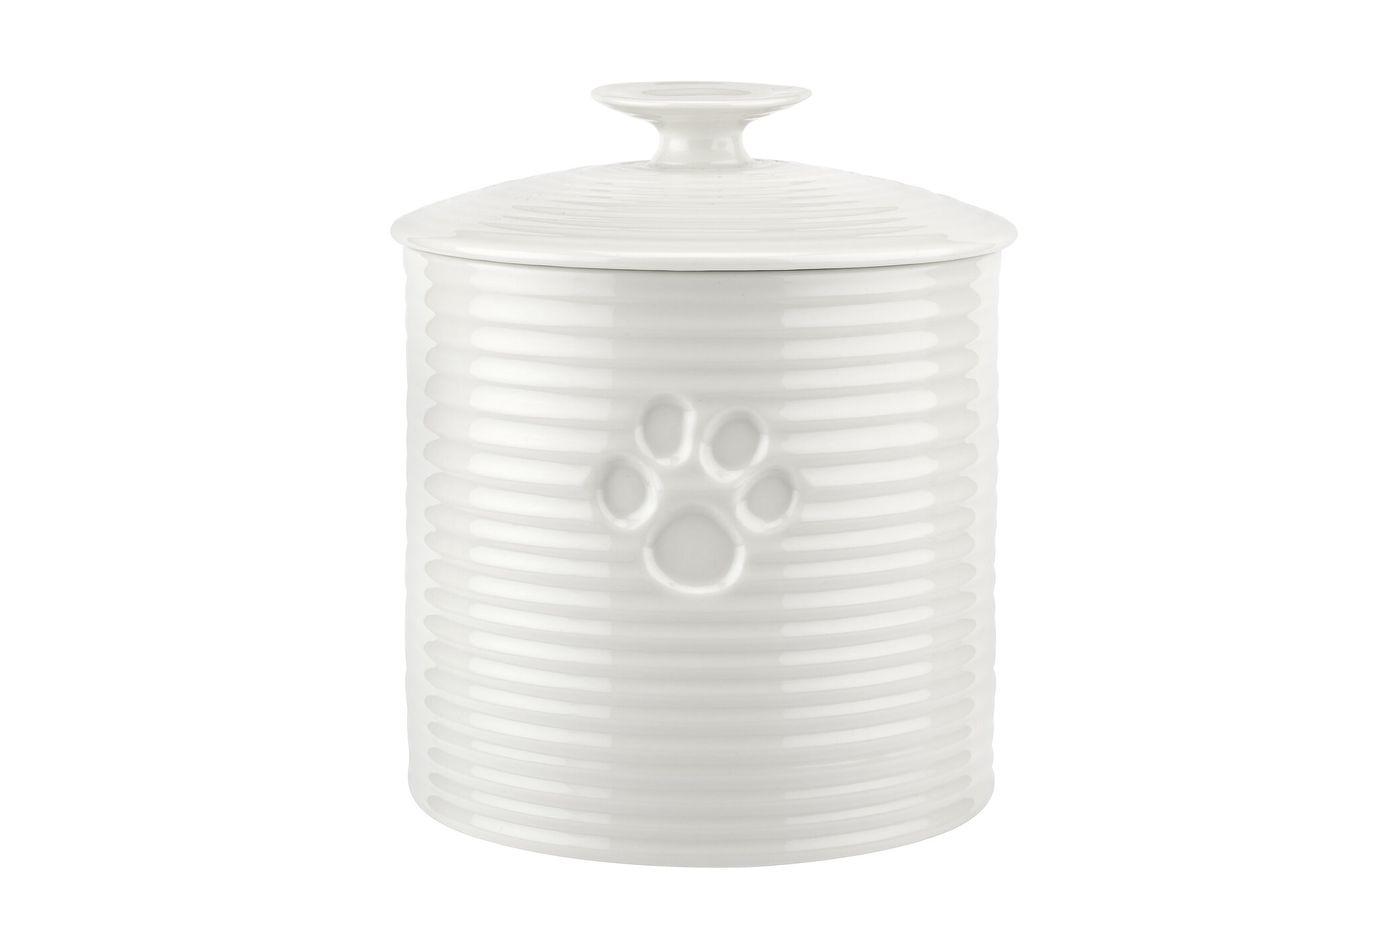 Sophie Conran for Portmeirion White Pet Treat Jar 16.5cm thumb 1